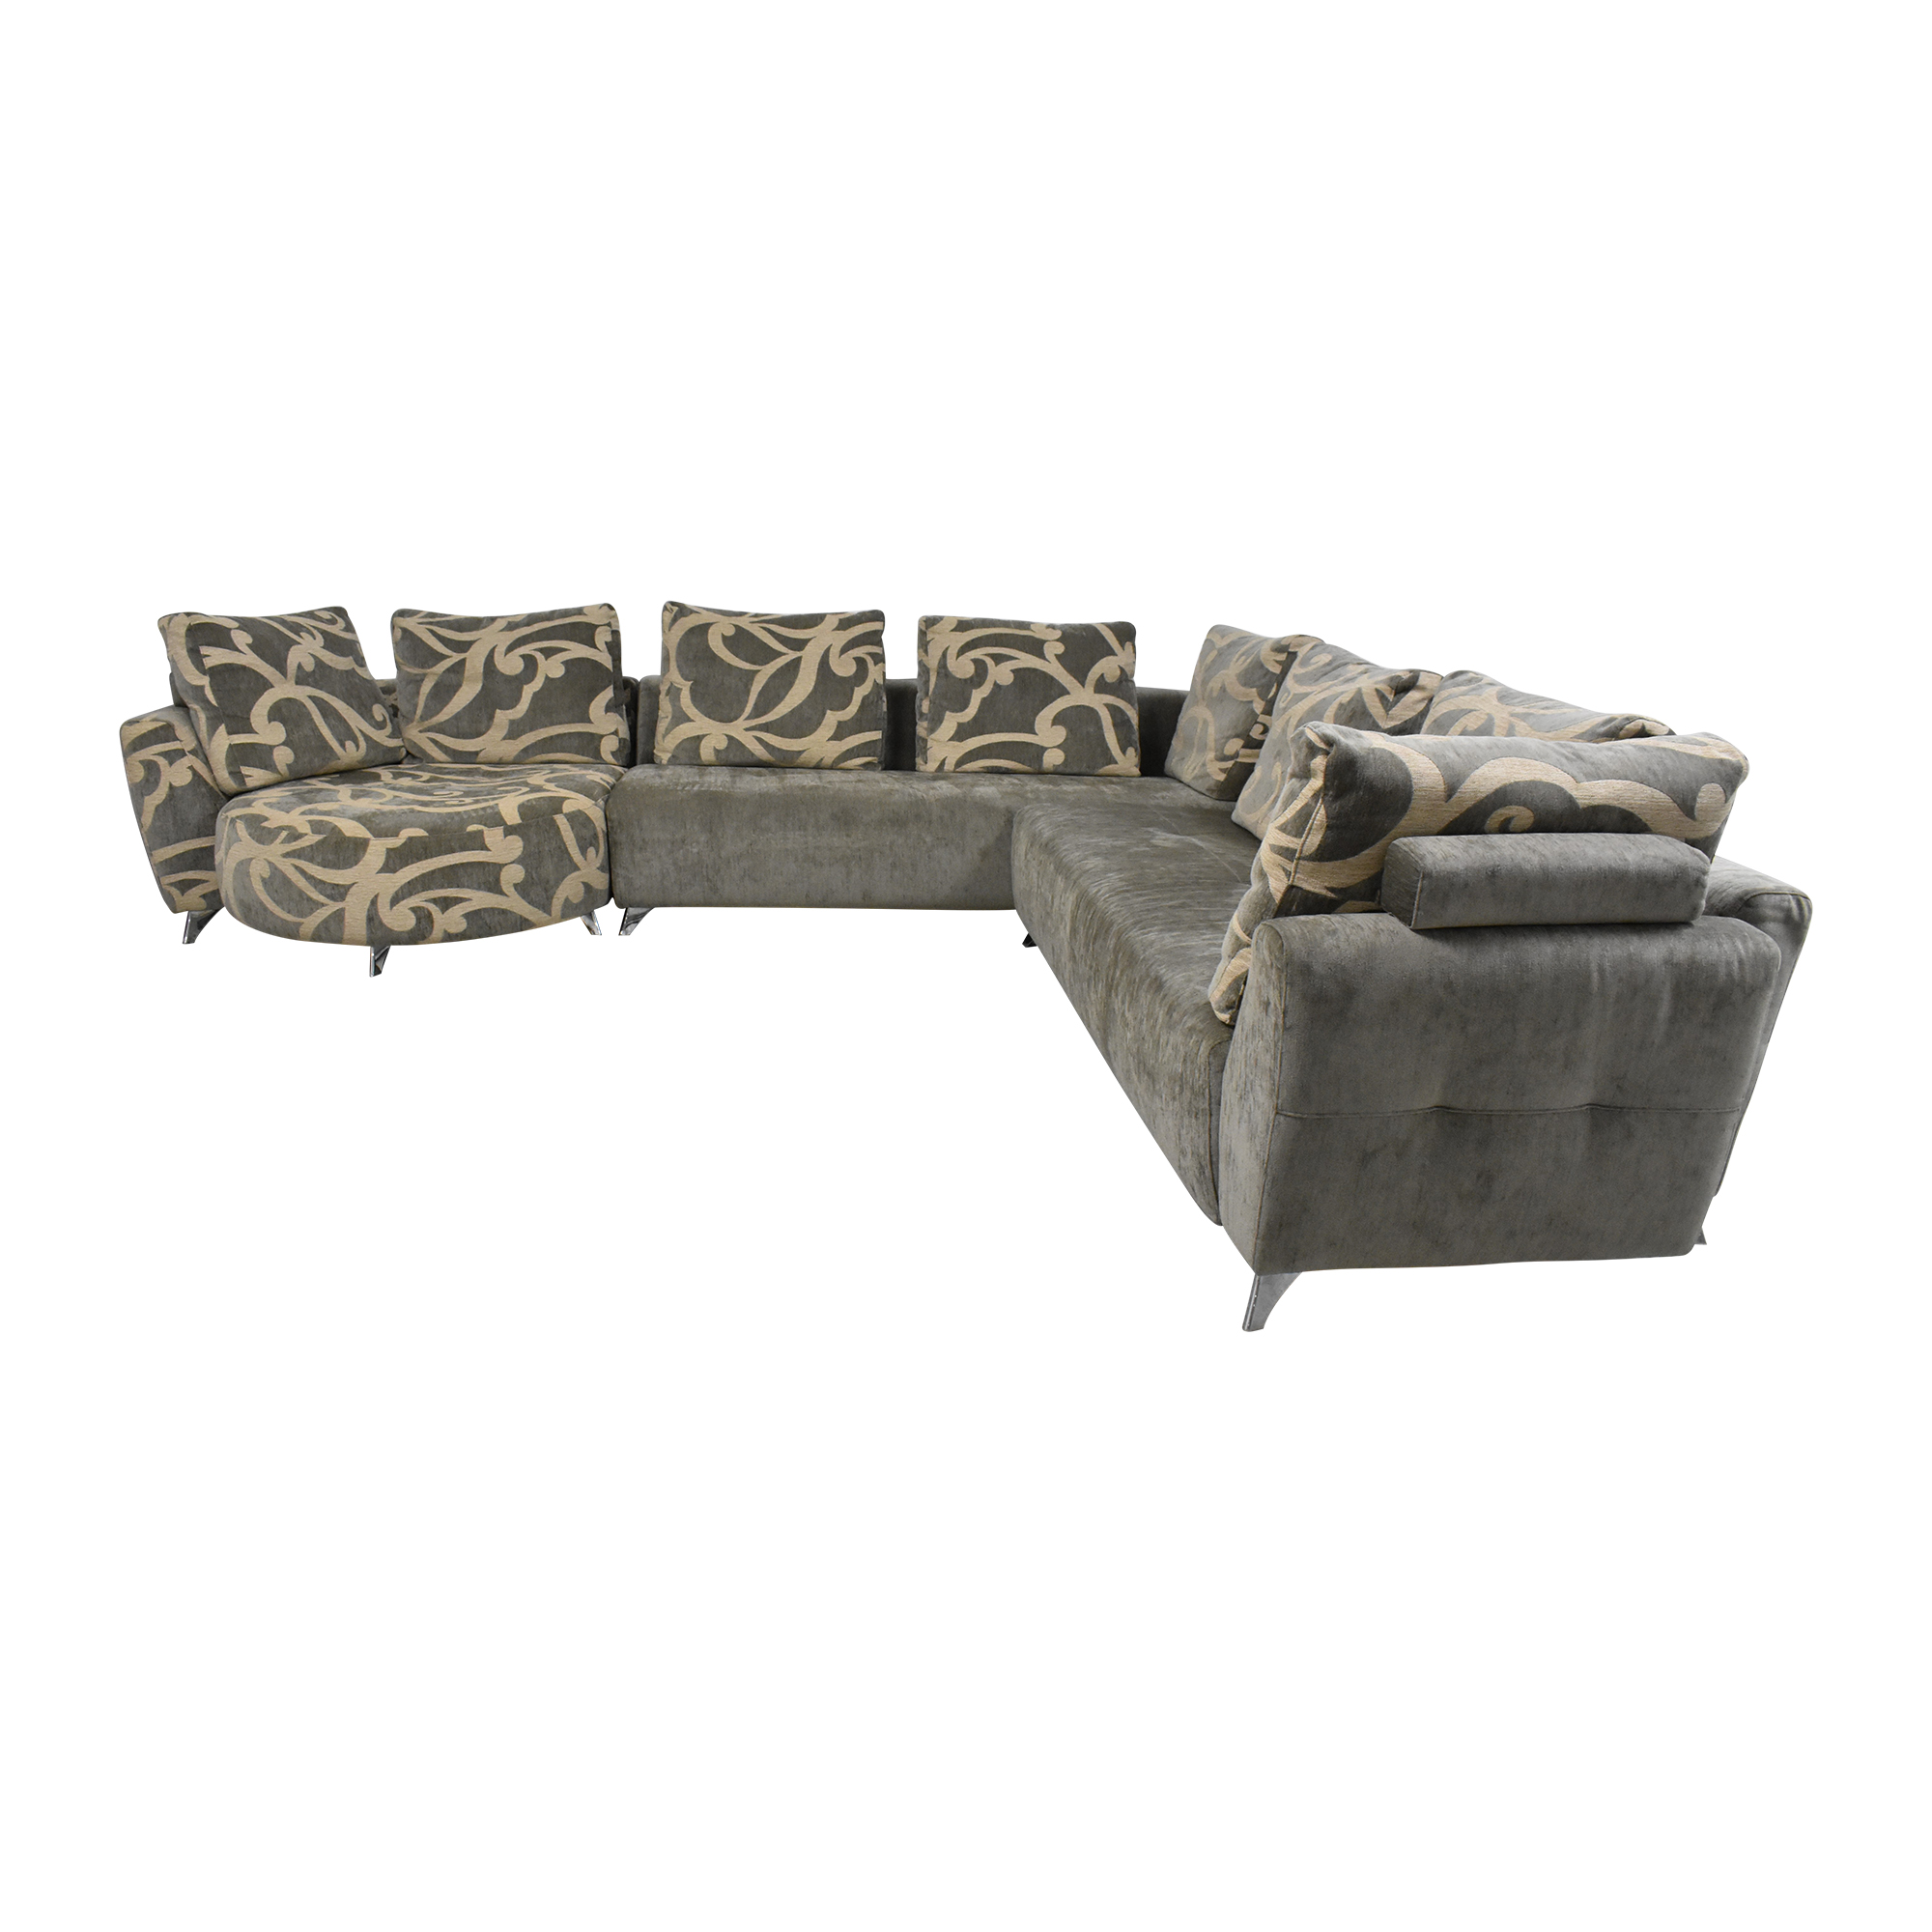 Fama Fama Valentina Modular Sectional Sofa